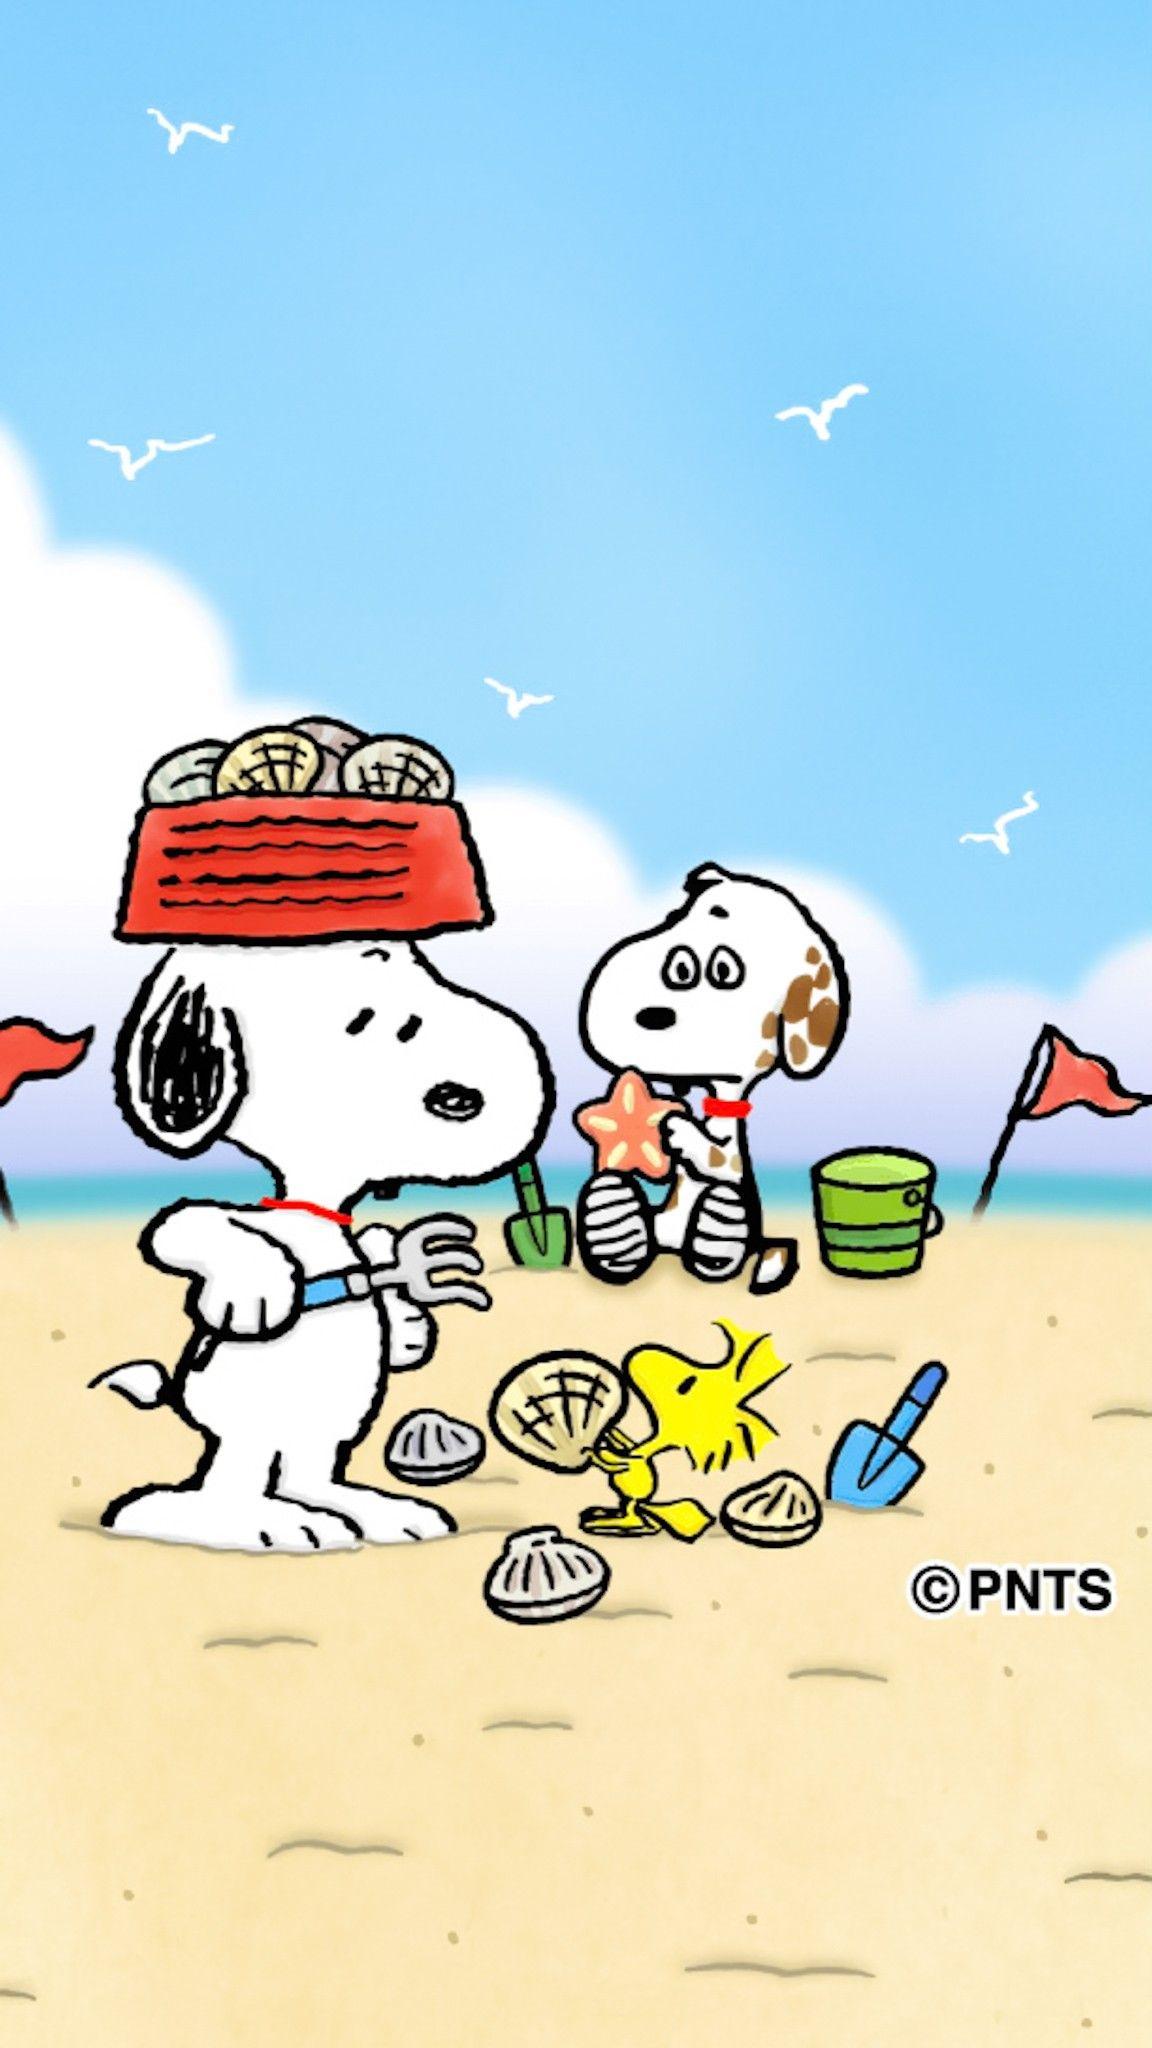 「Snoopy and woodstock」おしゃれまとめの人気アイデア|Pinterest|Joyce Ying